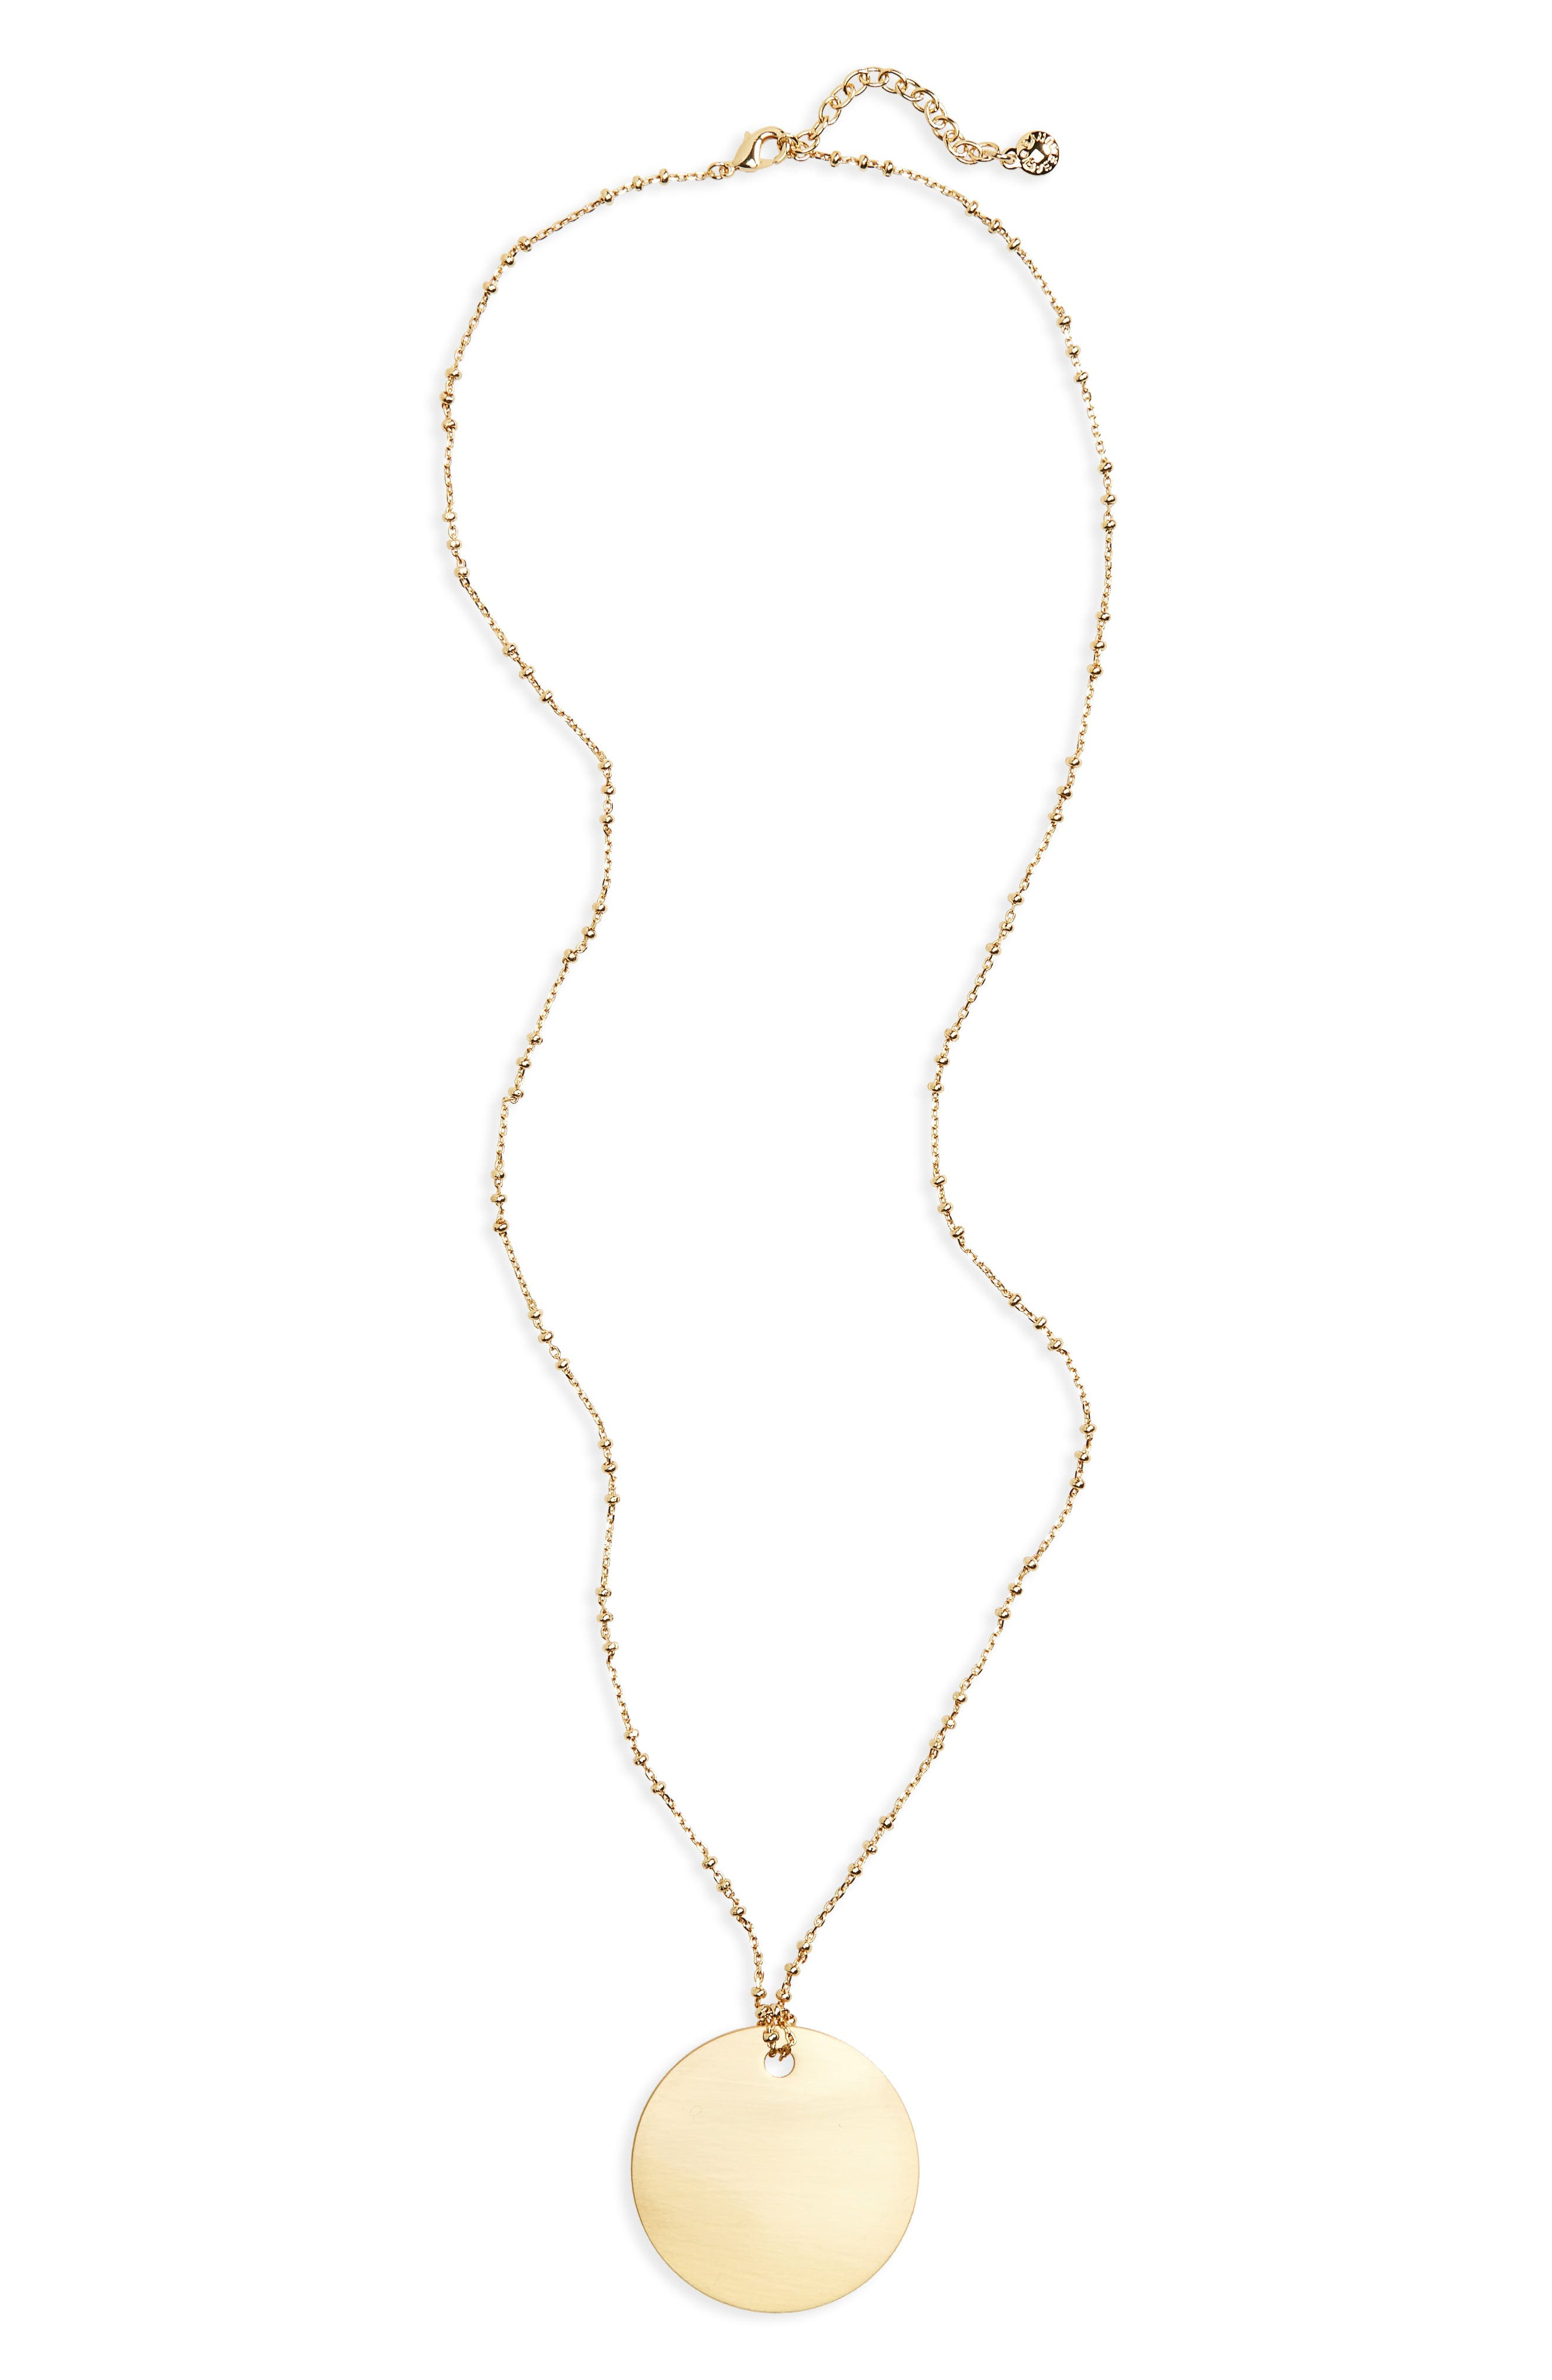 Alternate Image 1 Selected - BaubleBar Ada Pendant Necklace